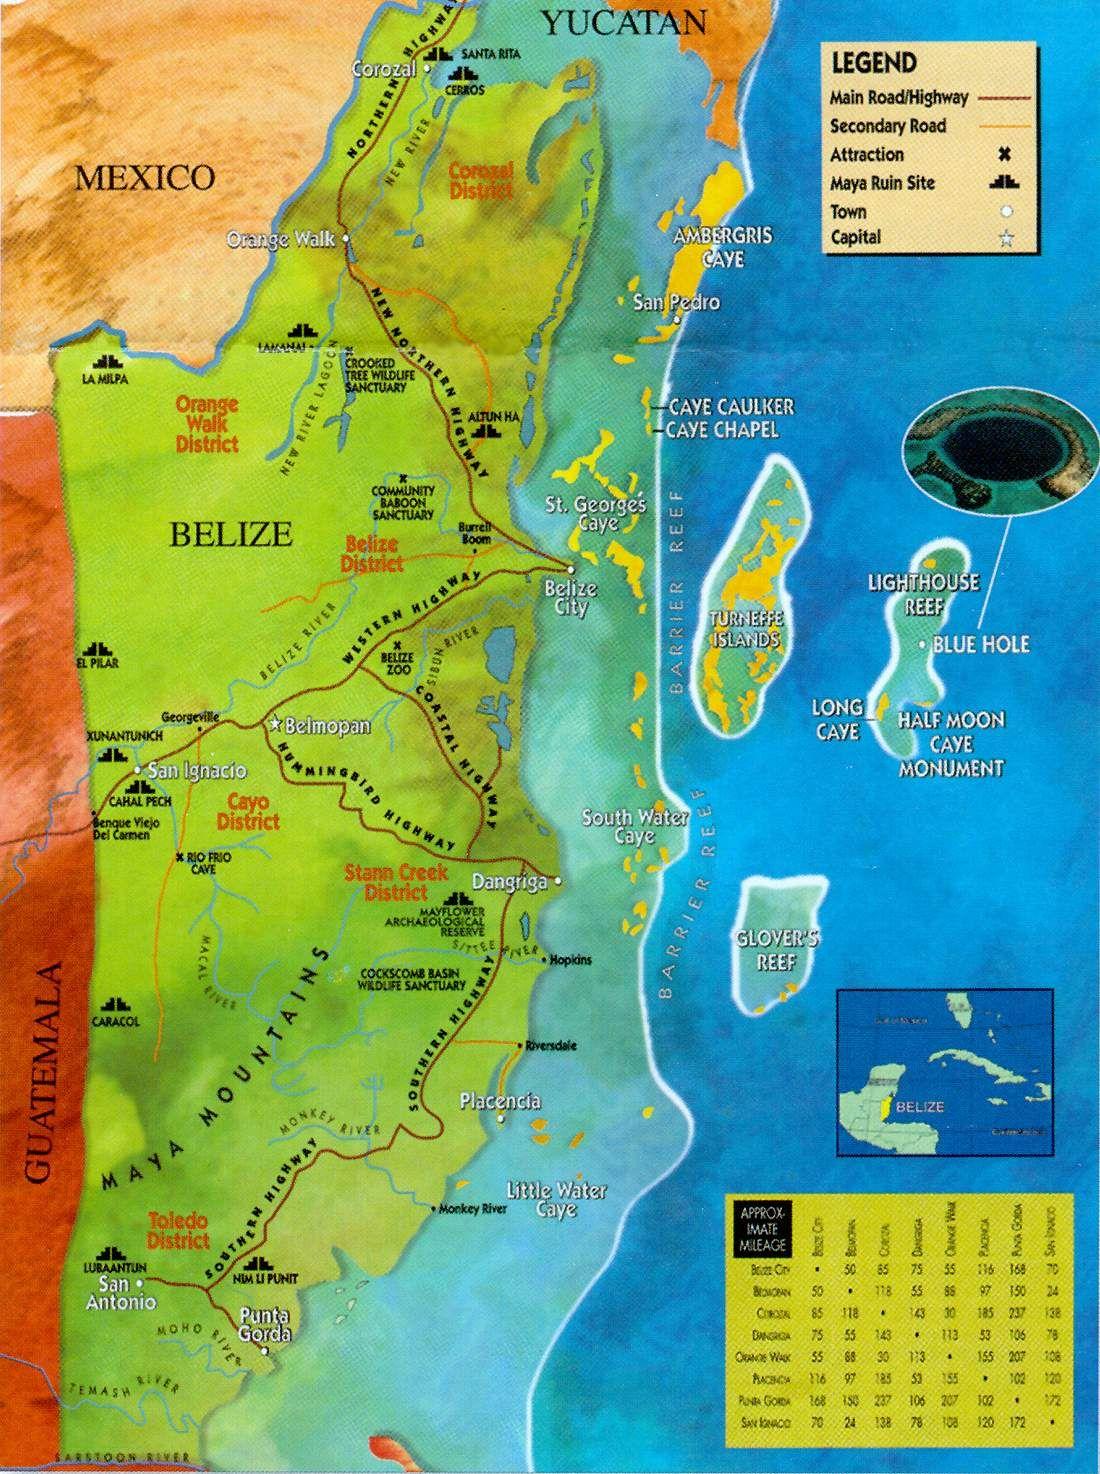 Belize Zoo And Ruins Map Of Belize Places Pinterest Belize - Belize tourist map